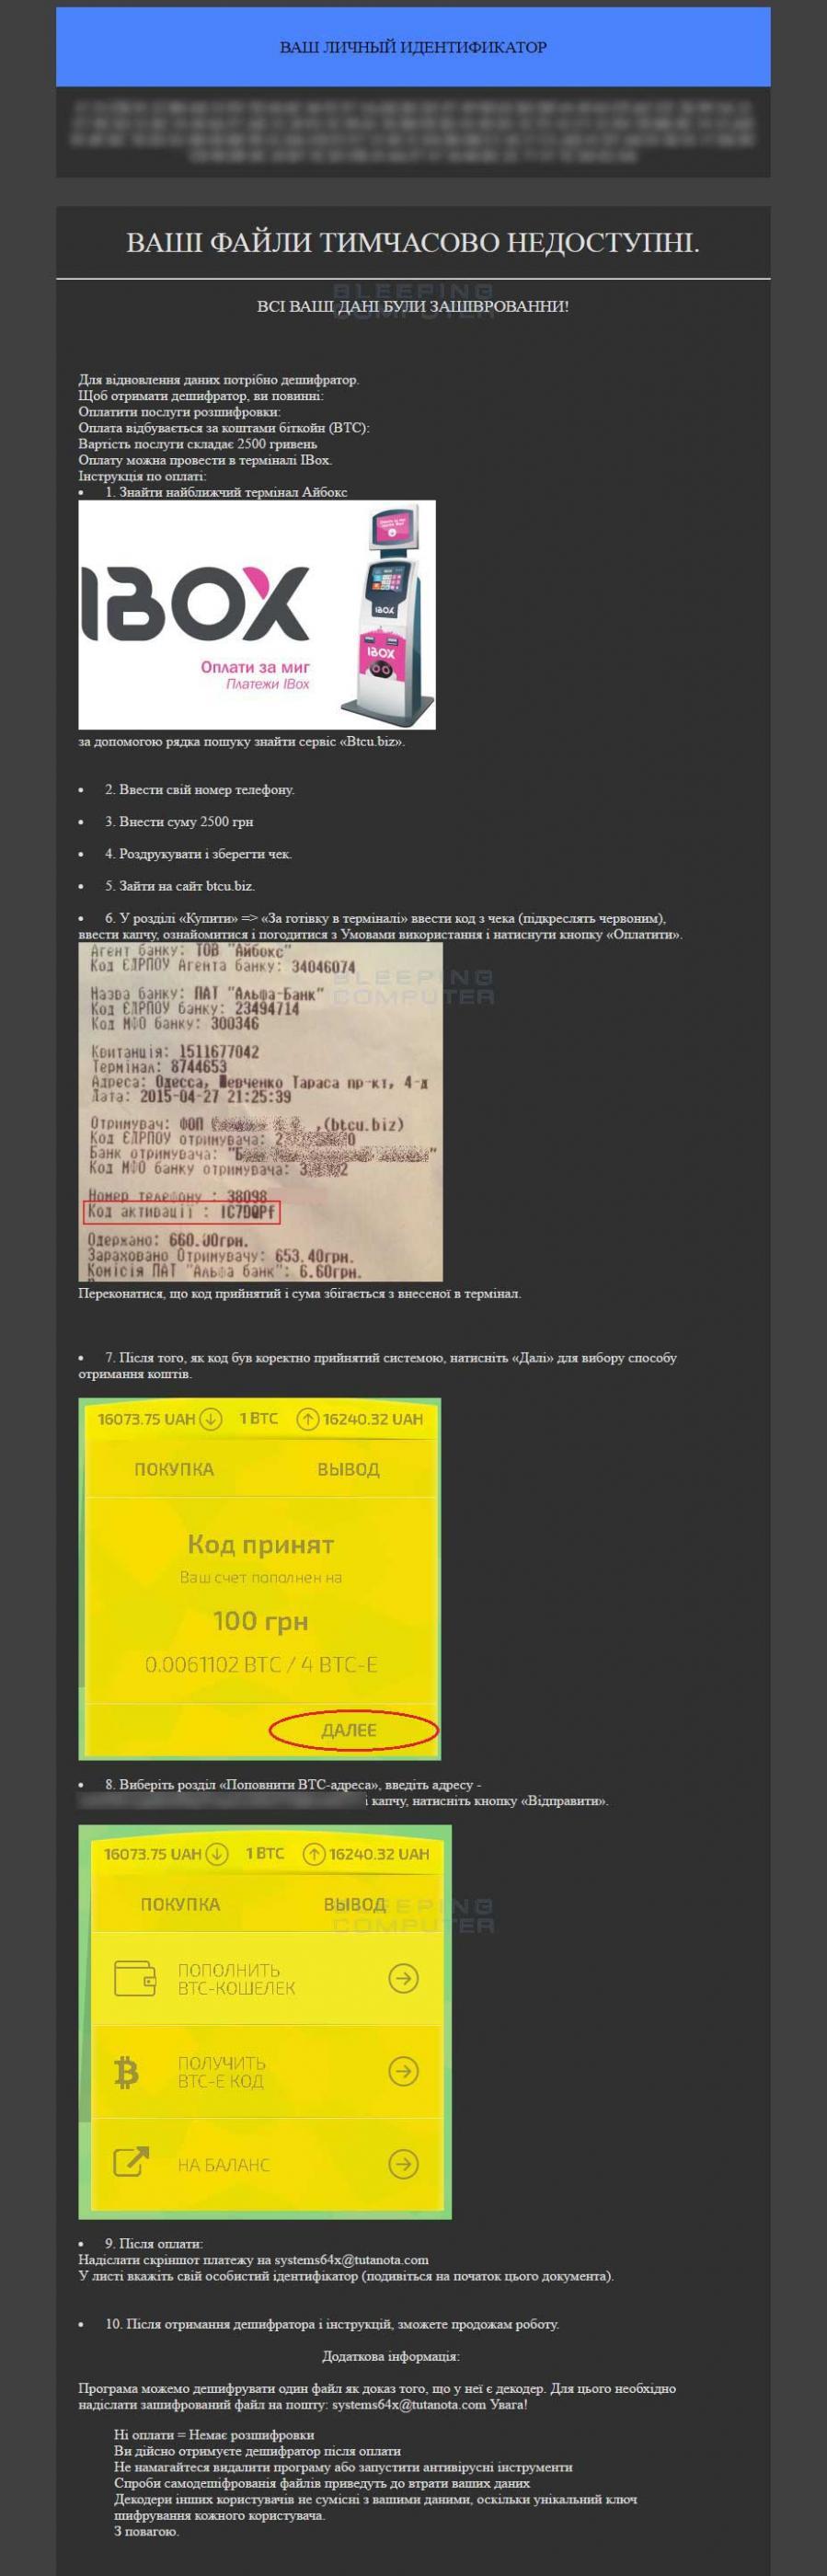 PSCrypt ransom note [Ukrainian]